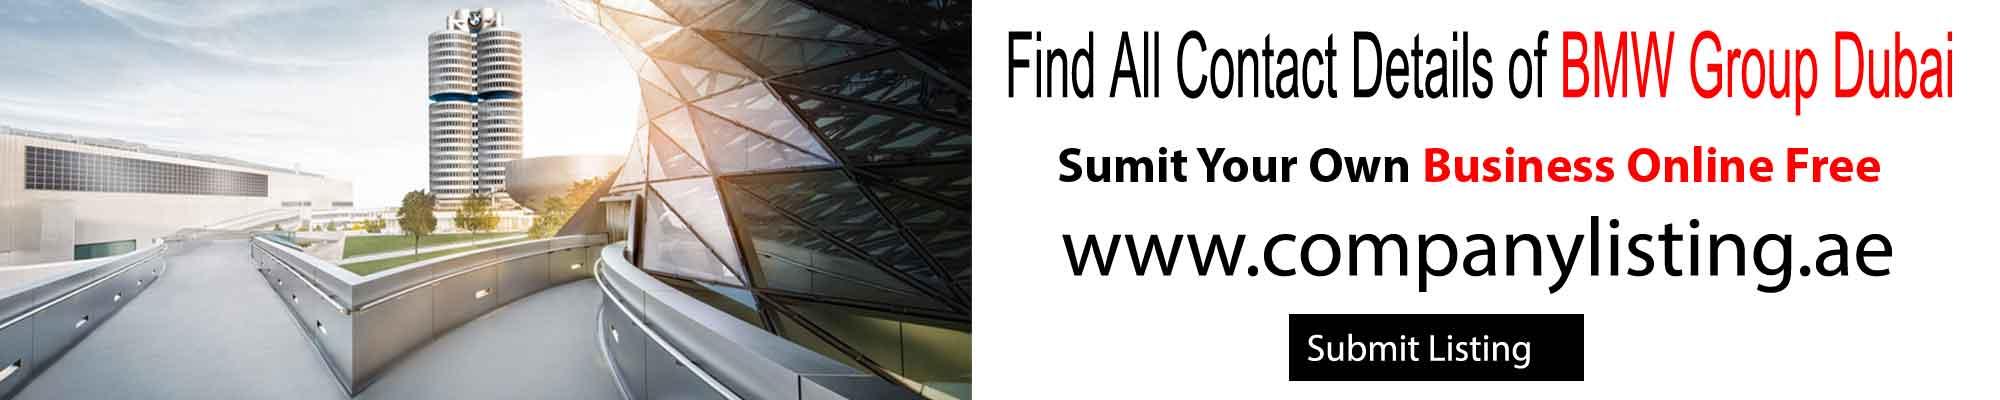 car rent company in dubai, car rental services company in dubai,